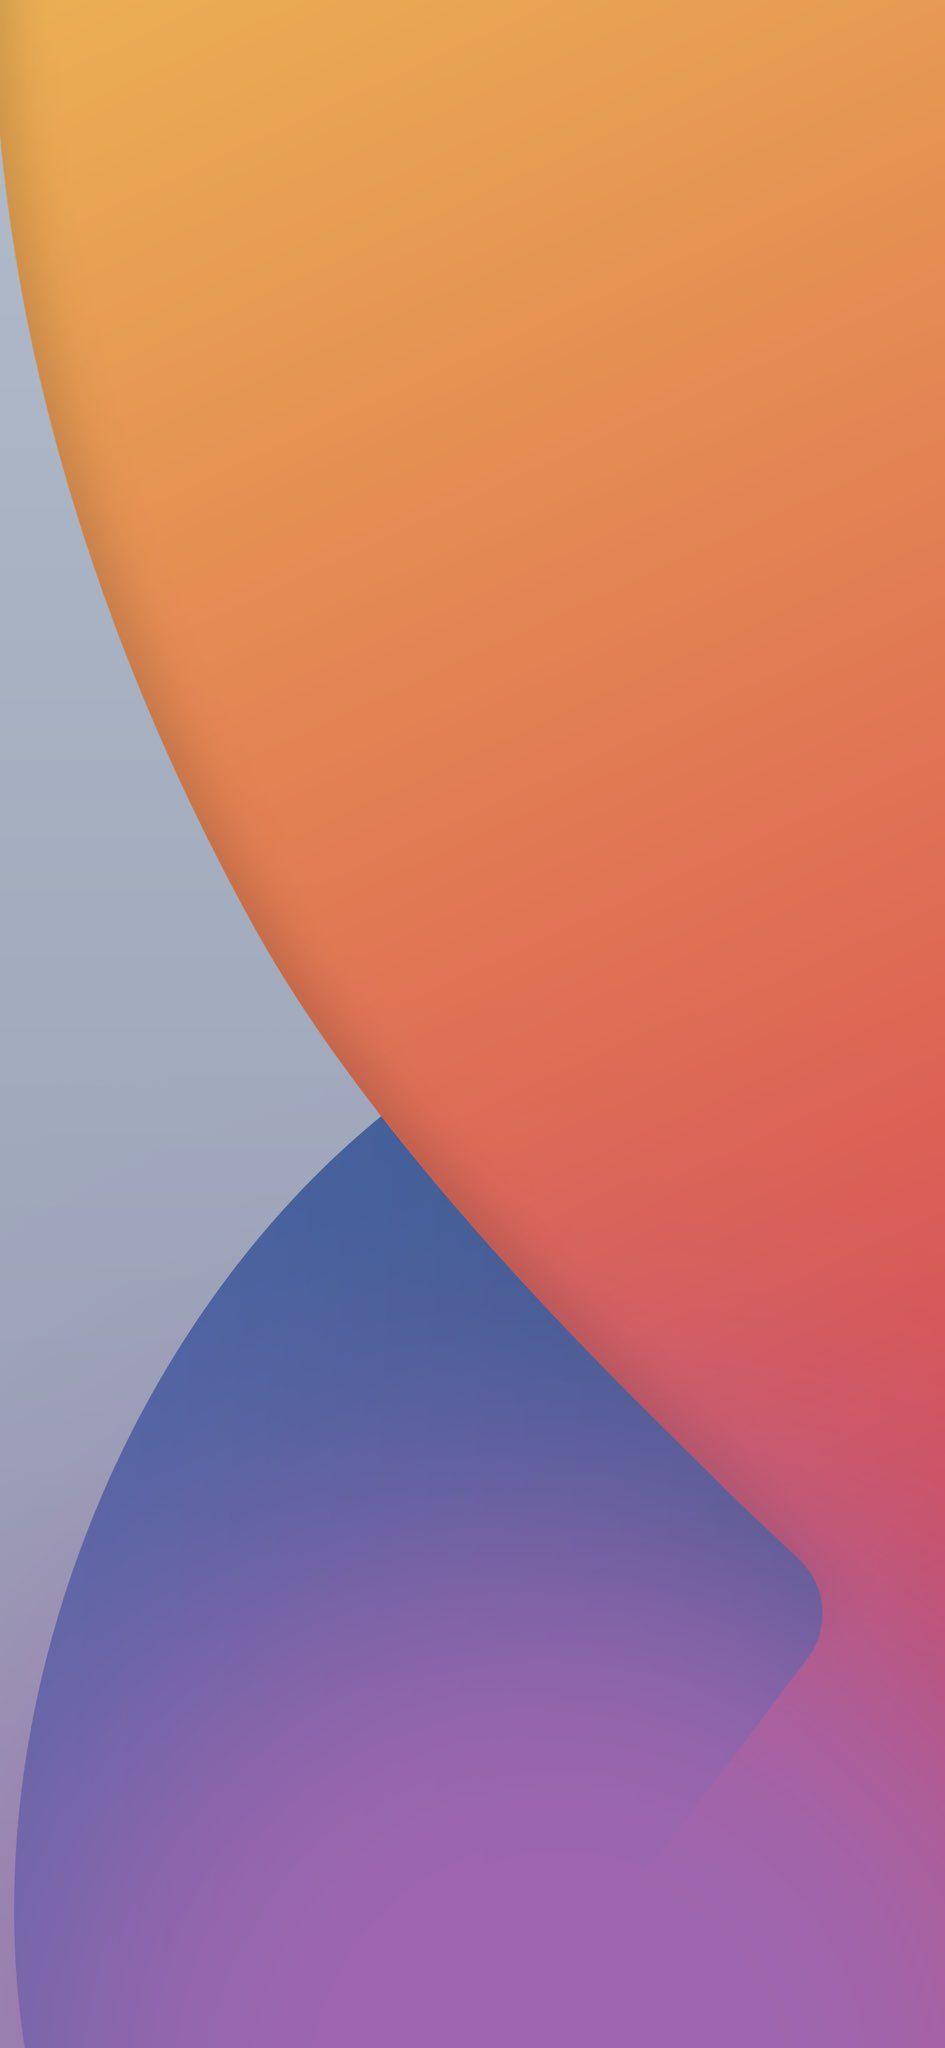 Ios 14 Wallpaper Iphone Lockscreen Wallpaper Ios 14 Wallpaper Iphone Wallpaper